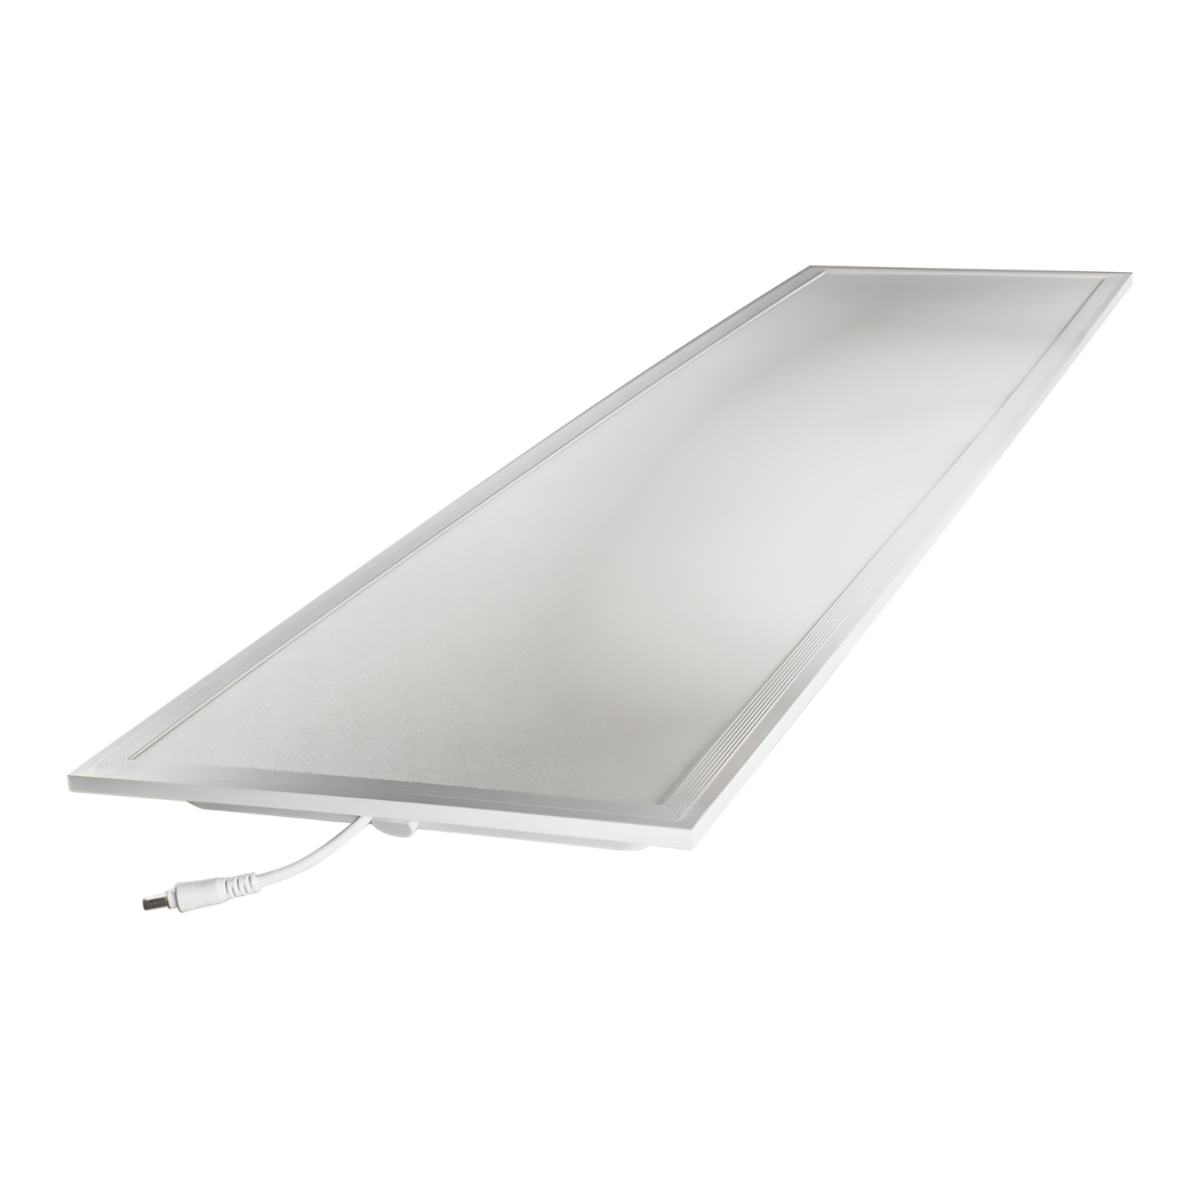 Noxion LED Panel Econox 32W Xitanium DALI 30x120cm 4000K 4400lm UGR <22 | Dali Dimmable - Replacer for 2x36W